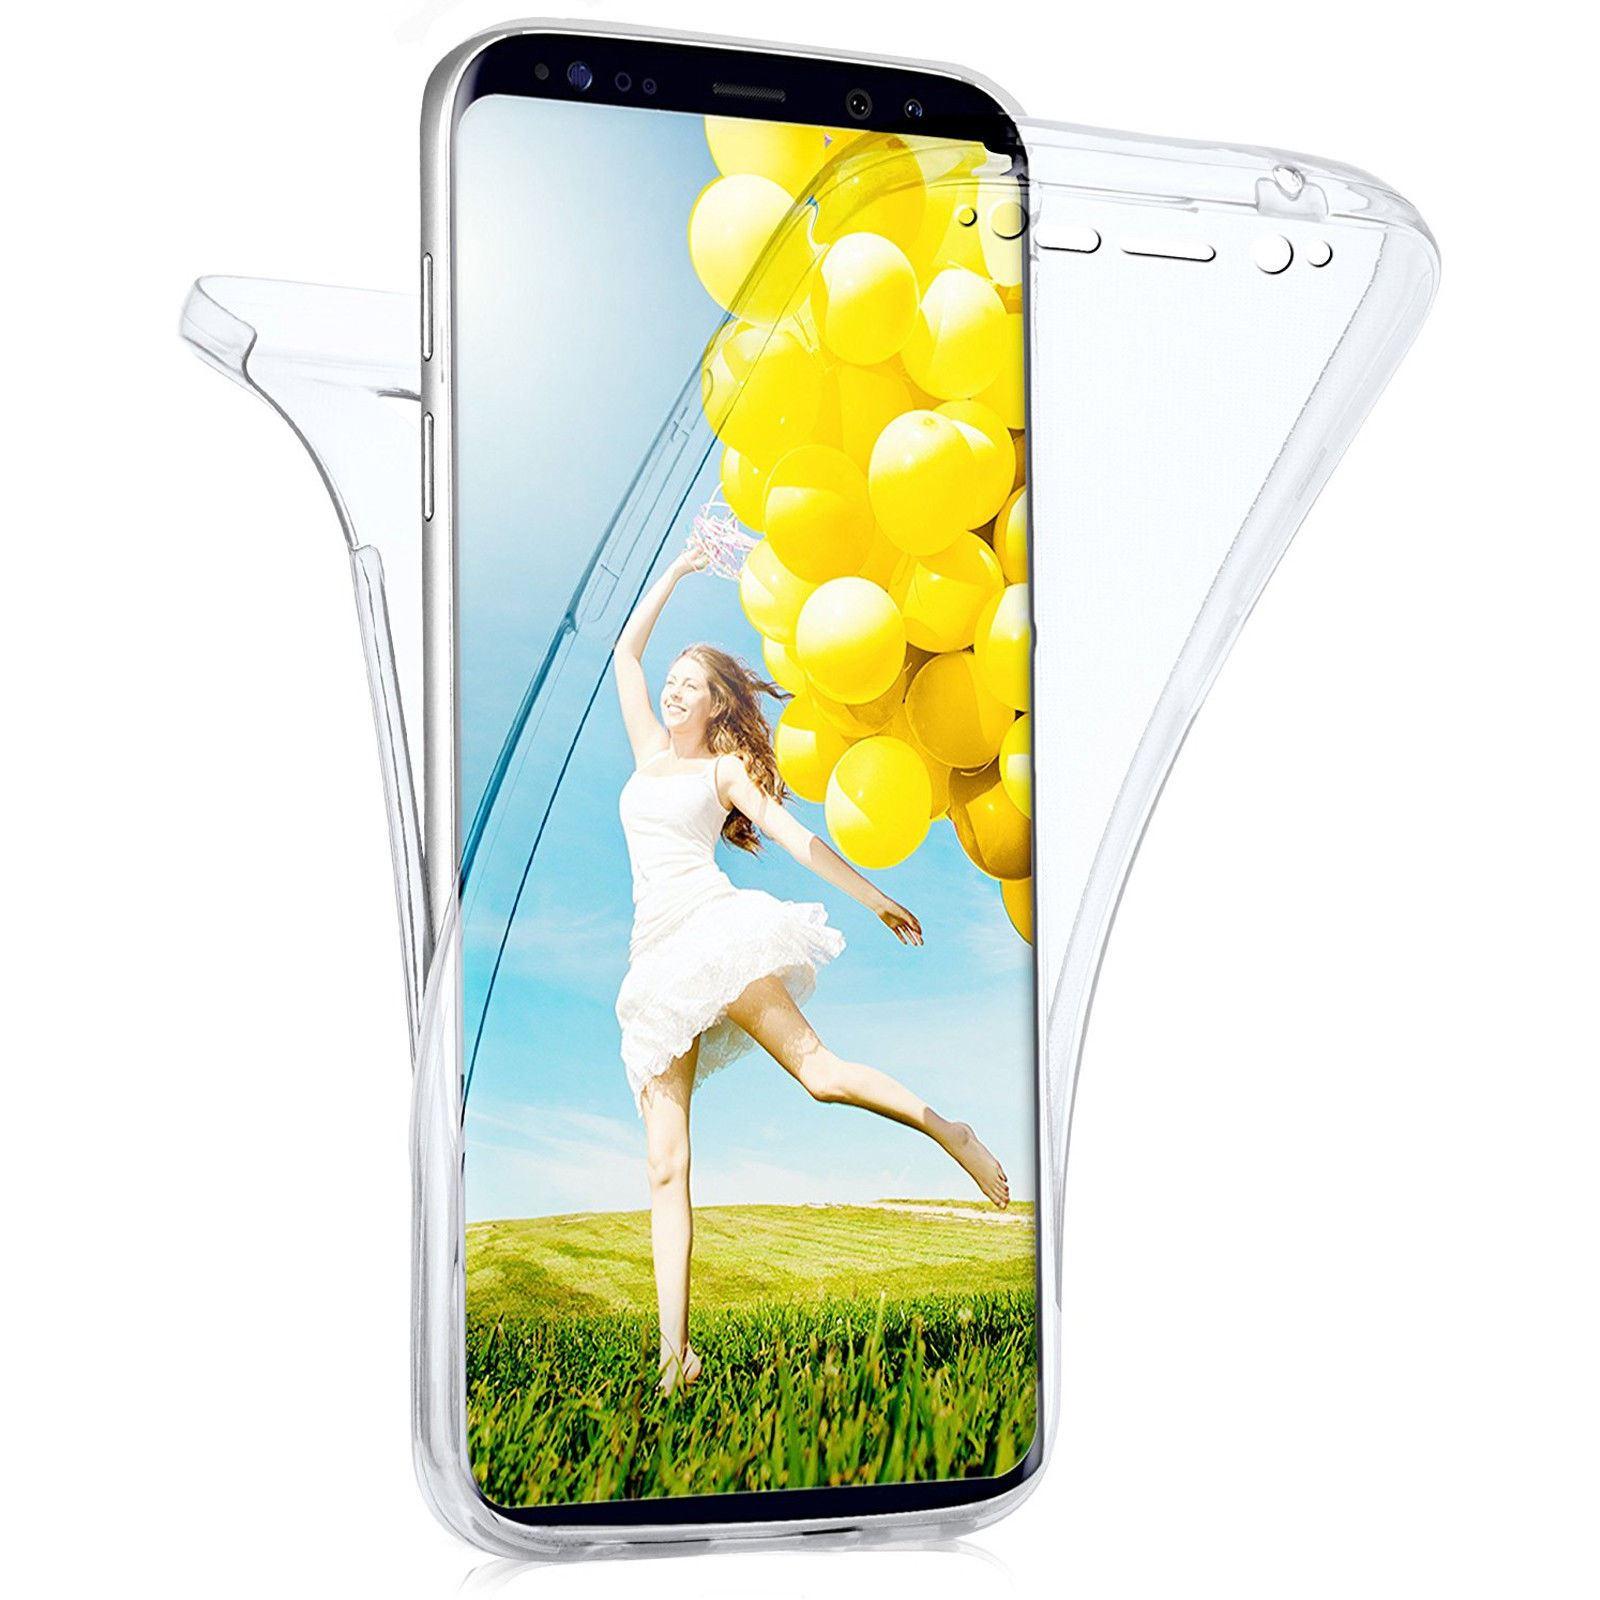 Funda-doble-silicona-TPU-Transparente-para-Samsung-Galaxy-S7-Edge-Hibrida-360